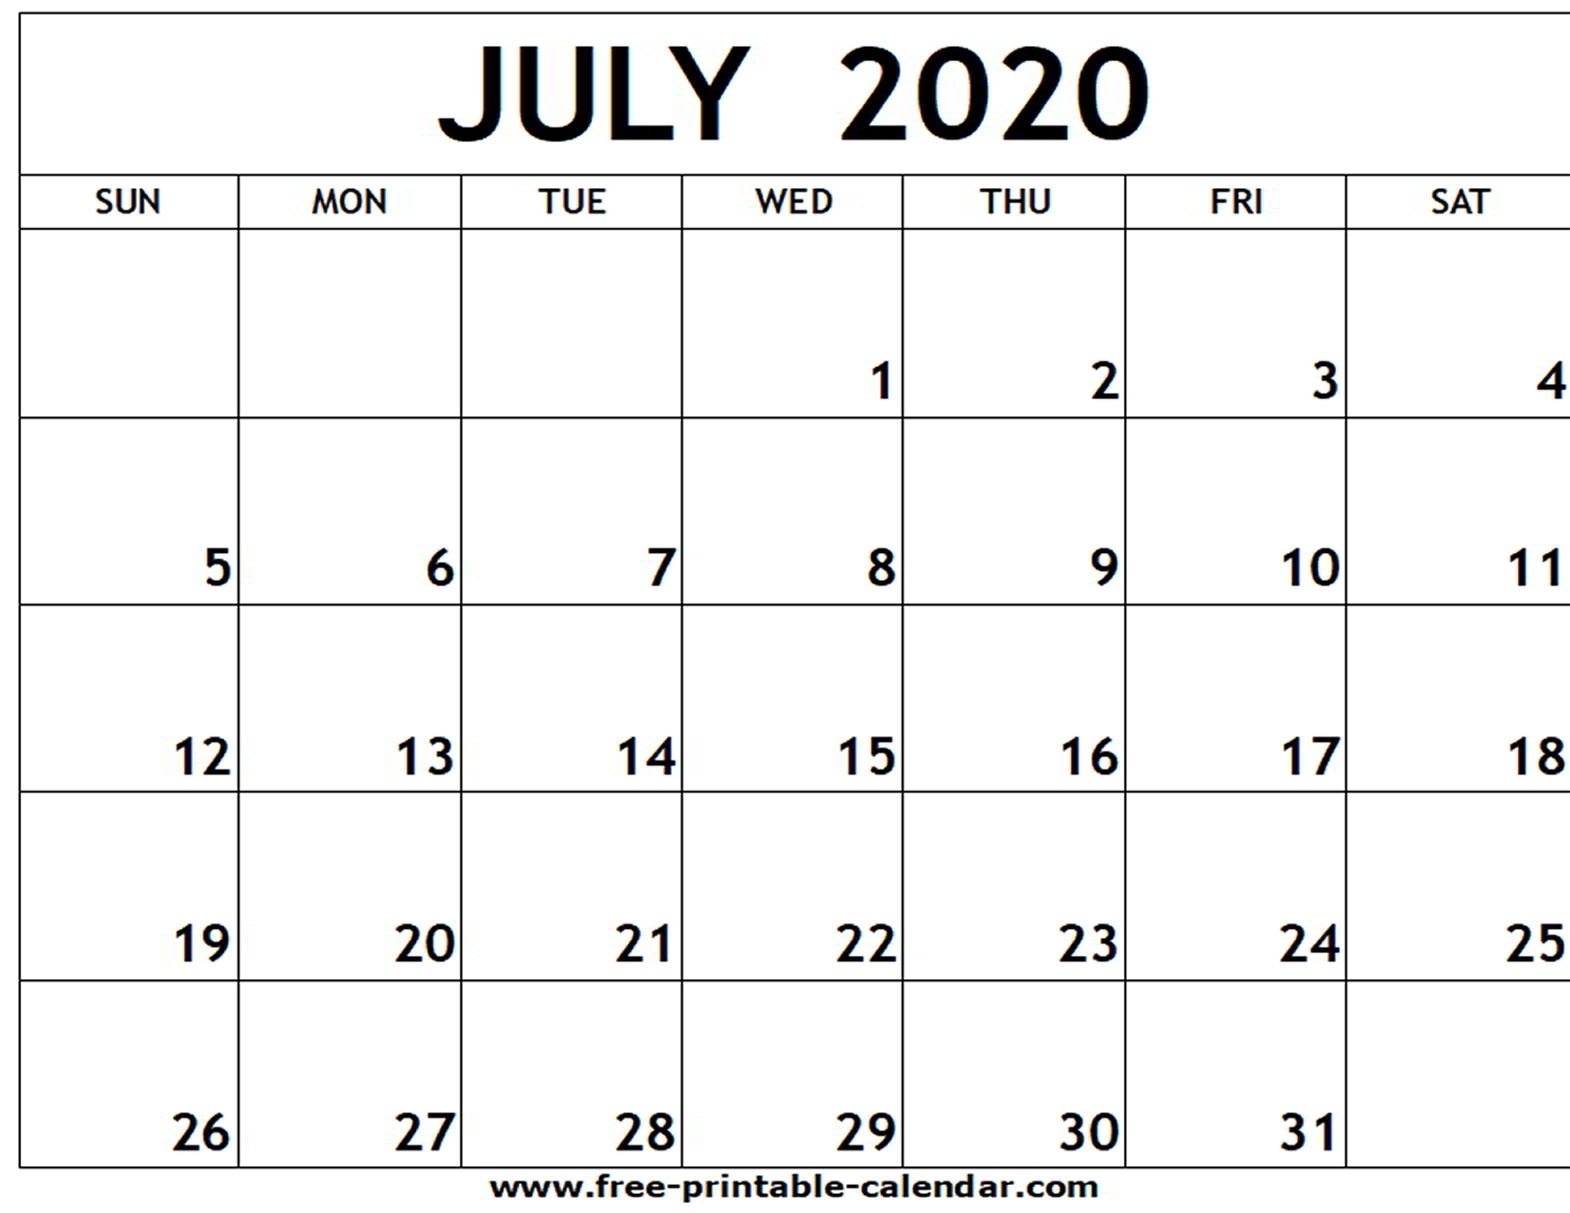 July 2020 Printable Calendar – Free-Printable-Calendar-Blank